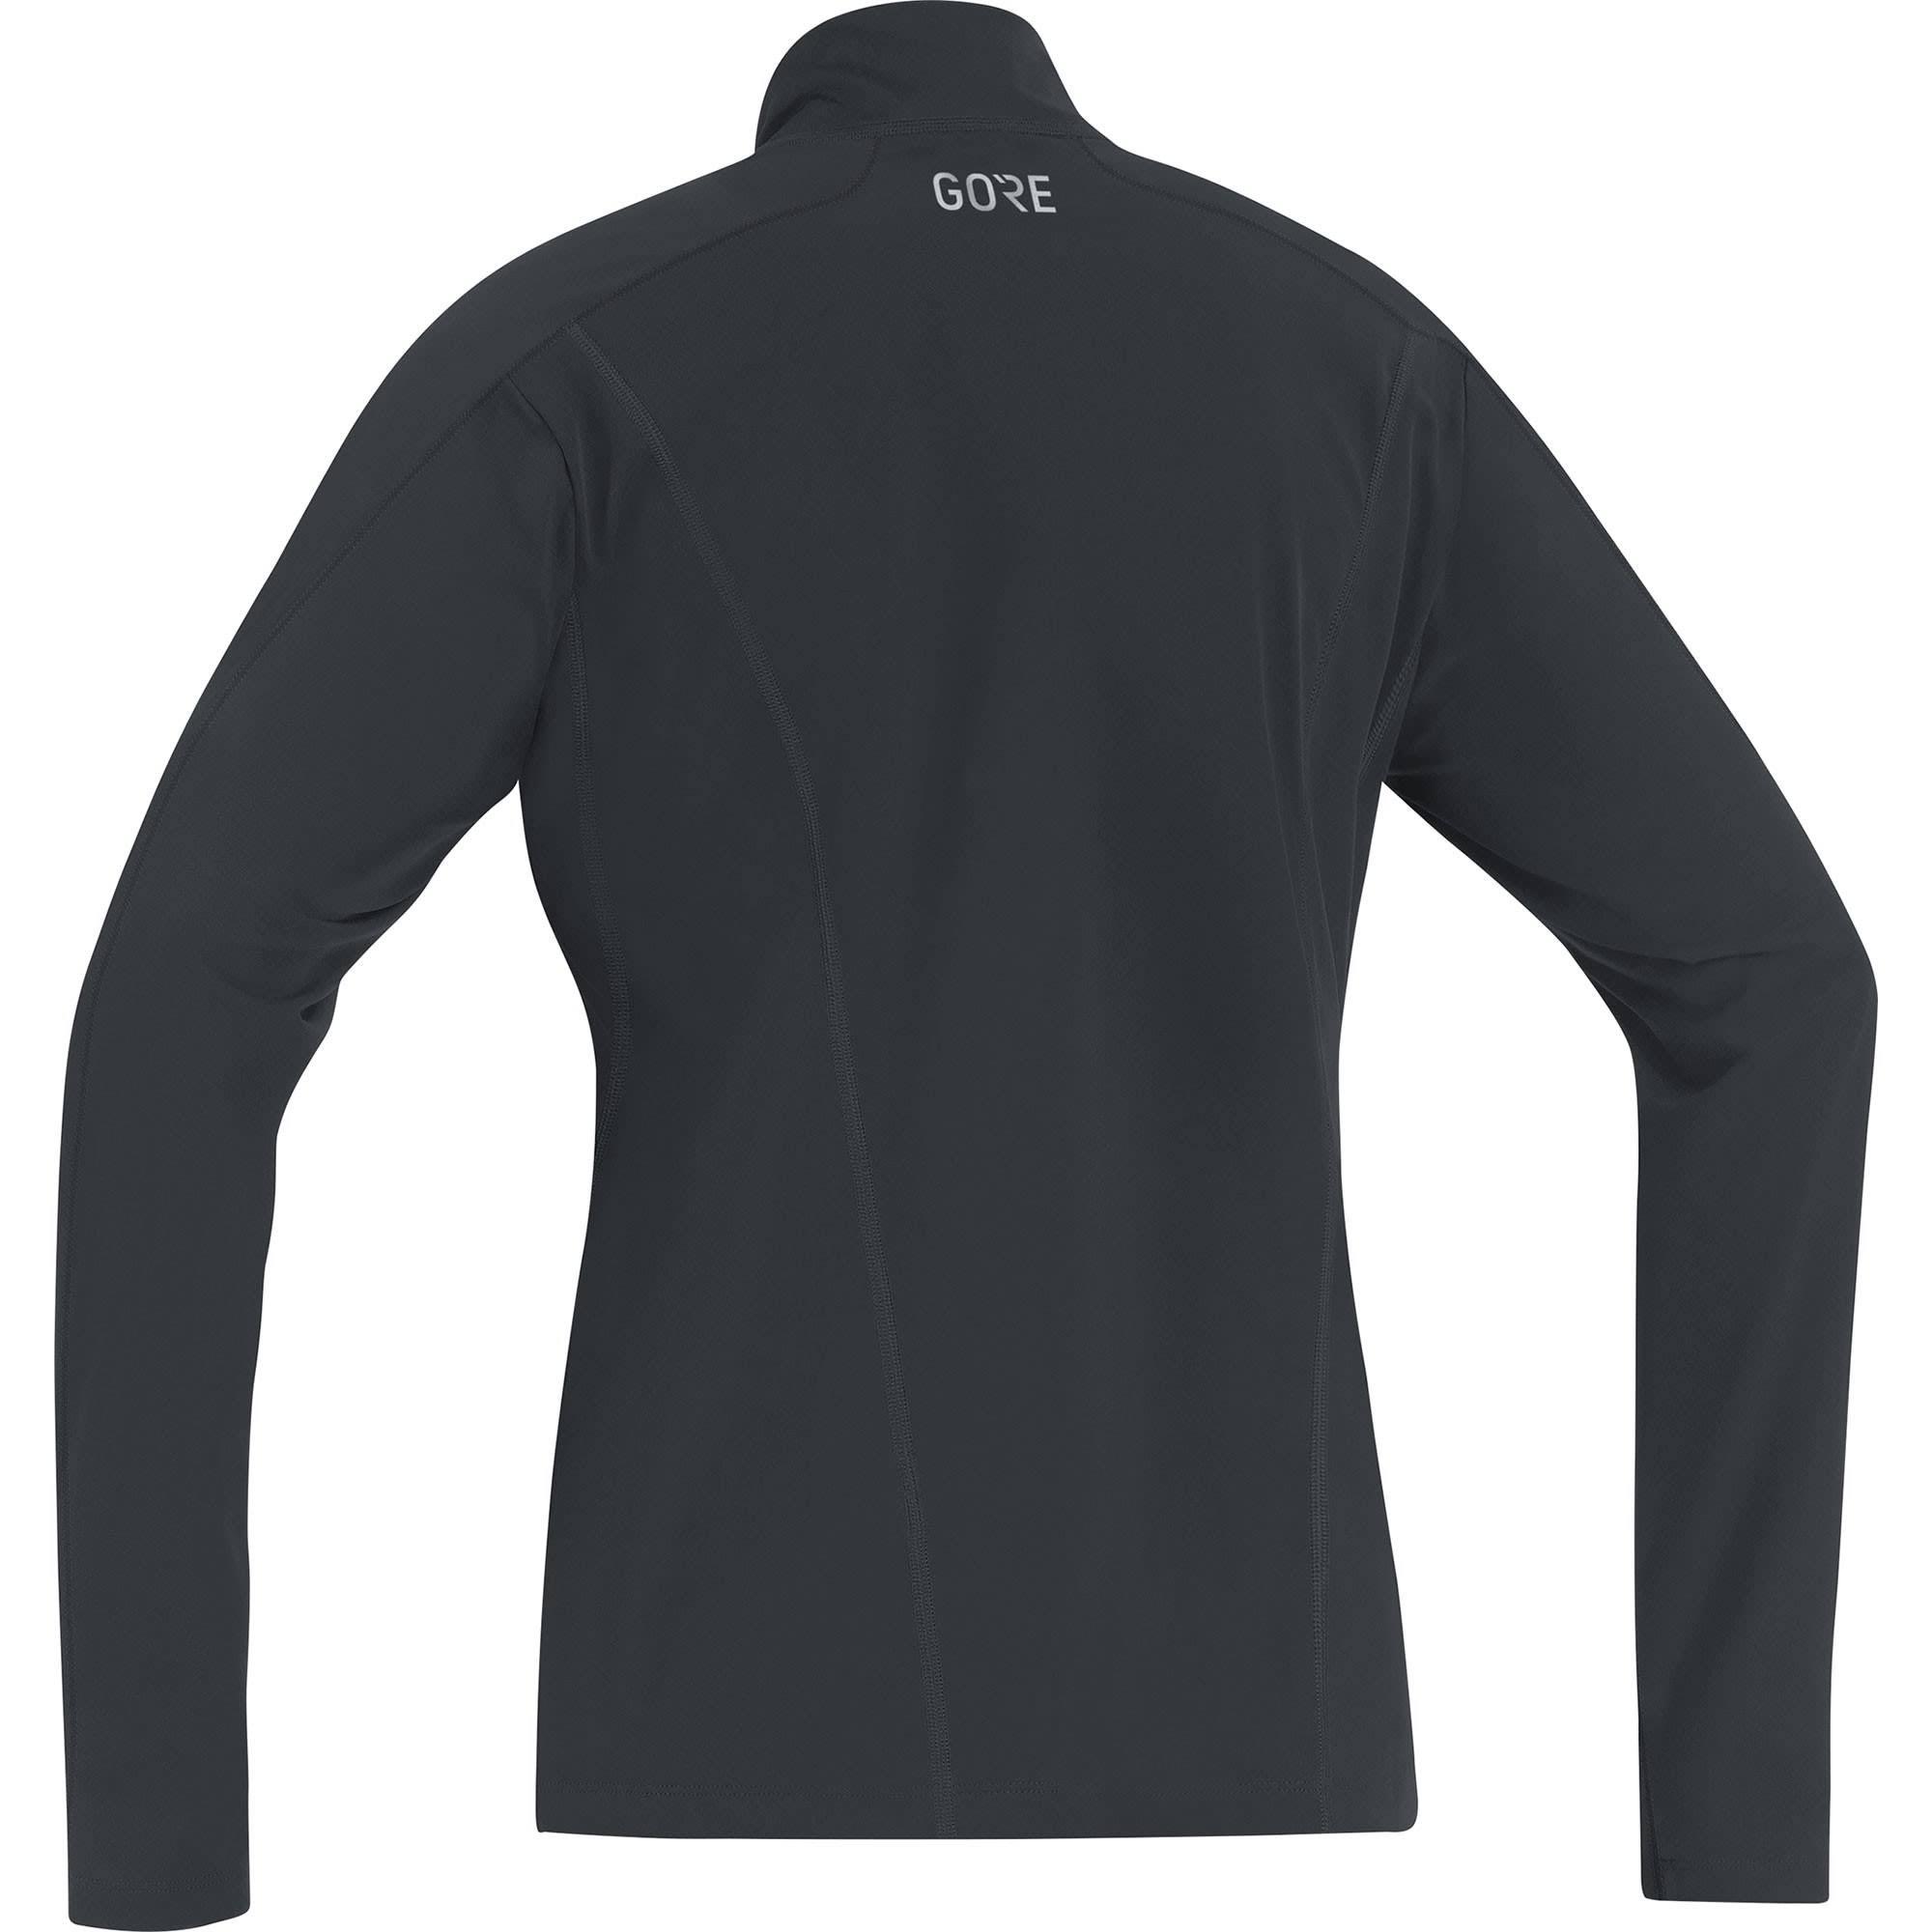 Gore Long Zip Thermo t Größe shirt Damen Langarm Shirt R3 34 Schwarz Sleeve Schwarz Farbe I4rwH4xq